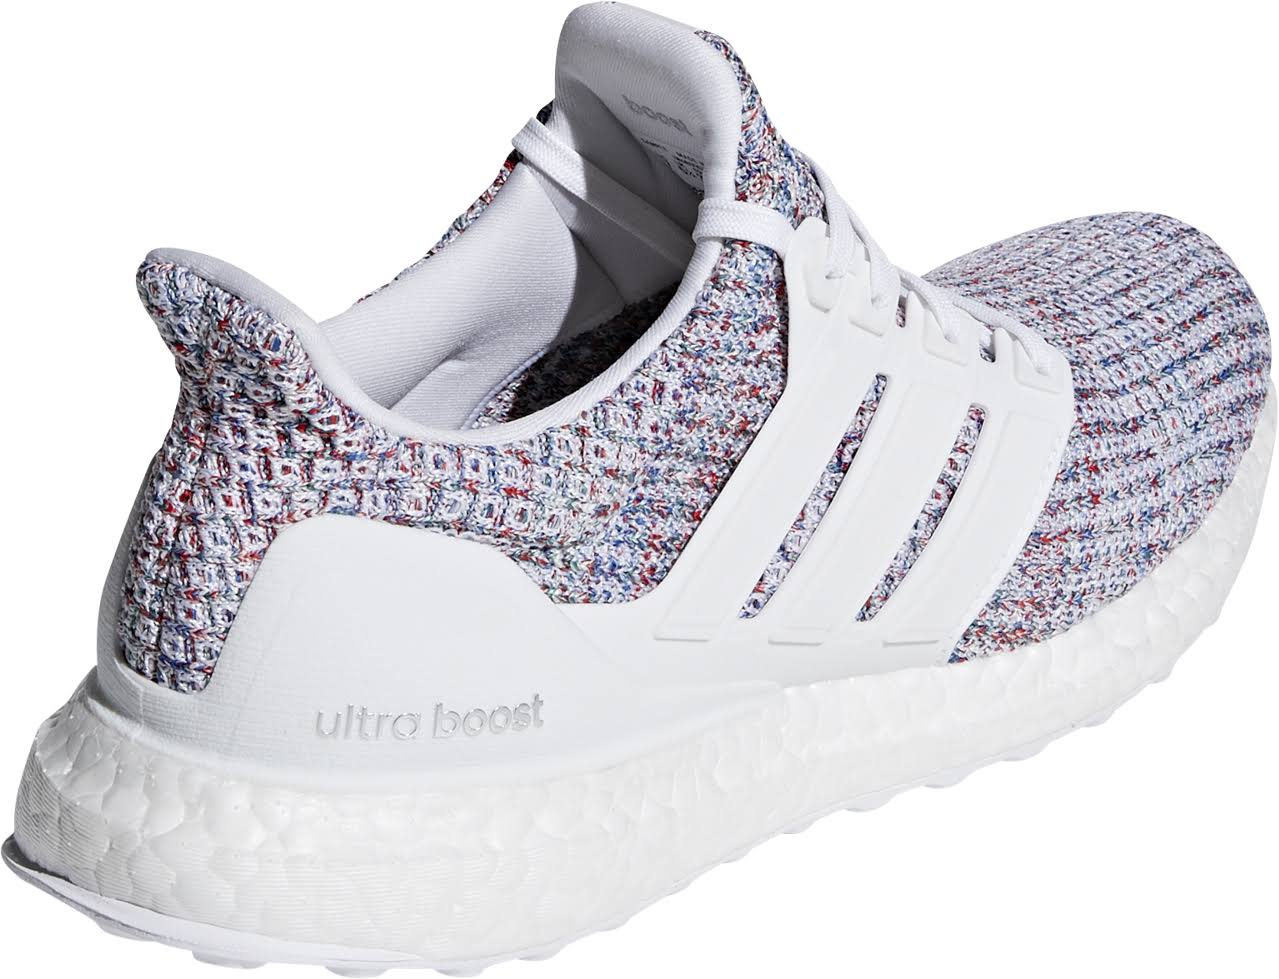 Adidas Db3211 Ultraboost W Adidas W Ftwrwhiteactivered Ultraboost rBWoCdxe